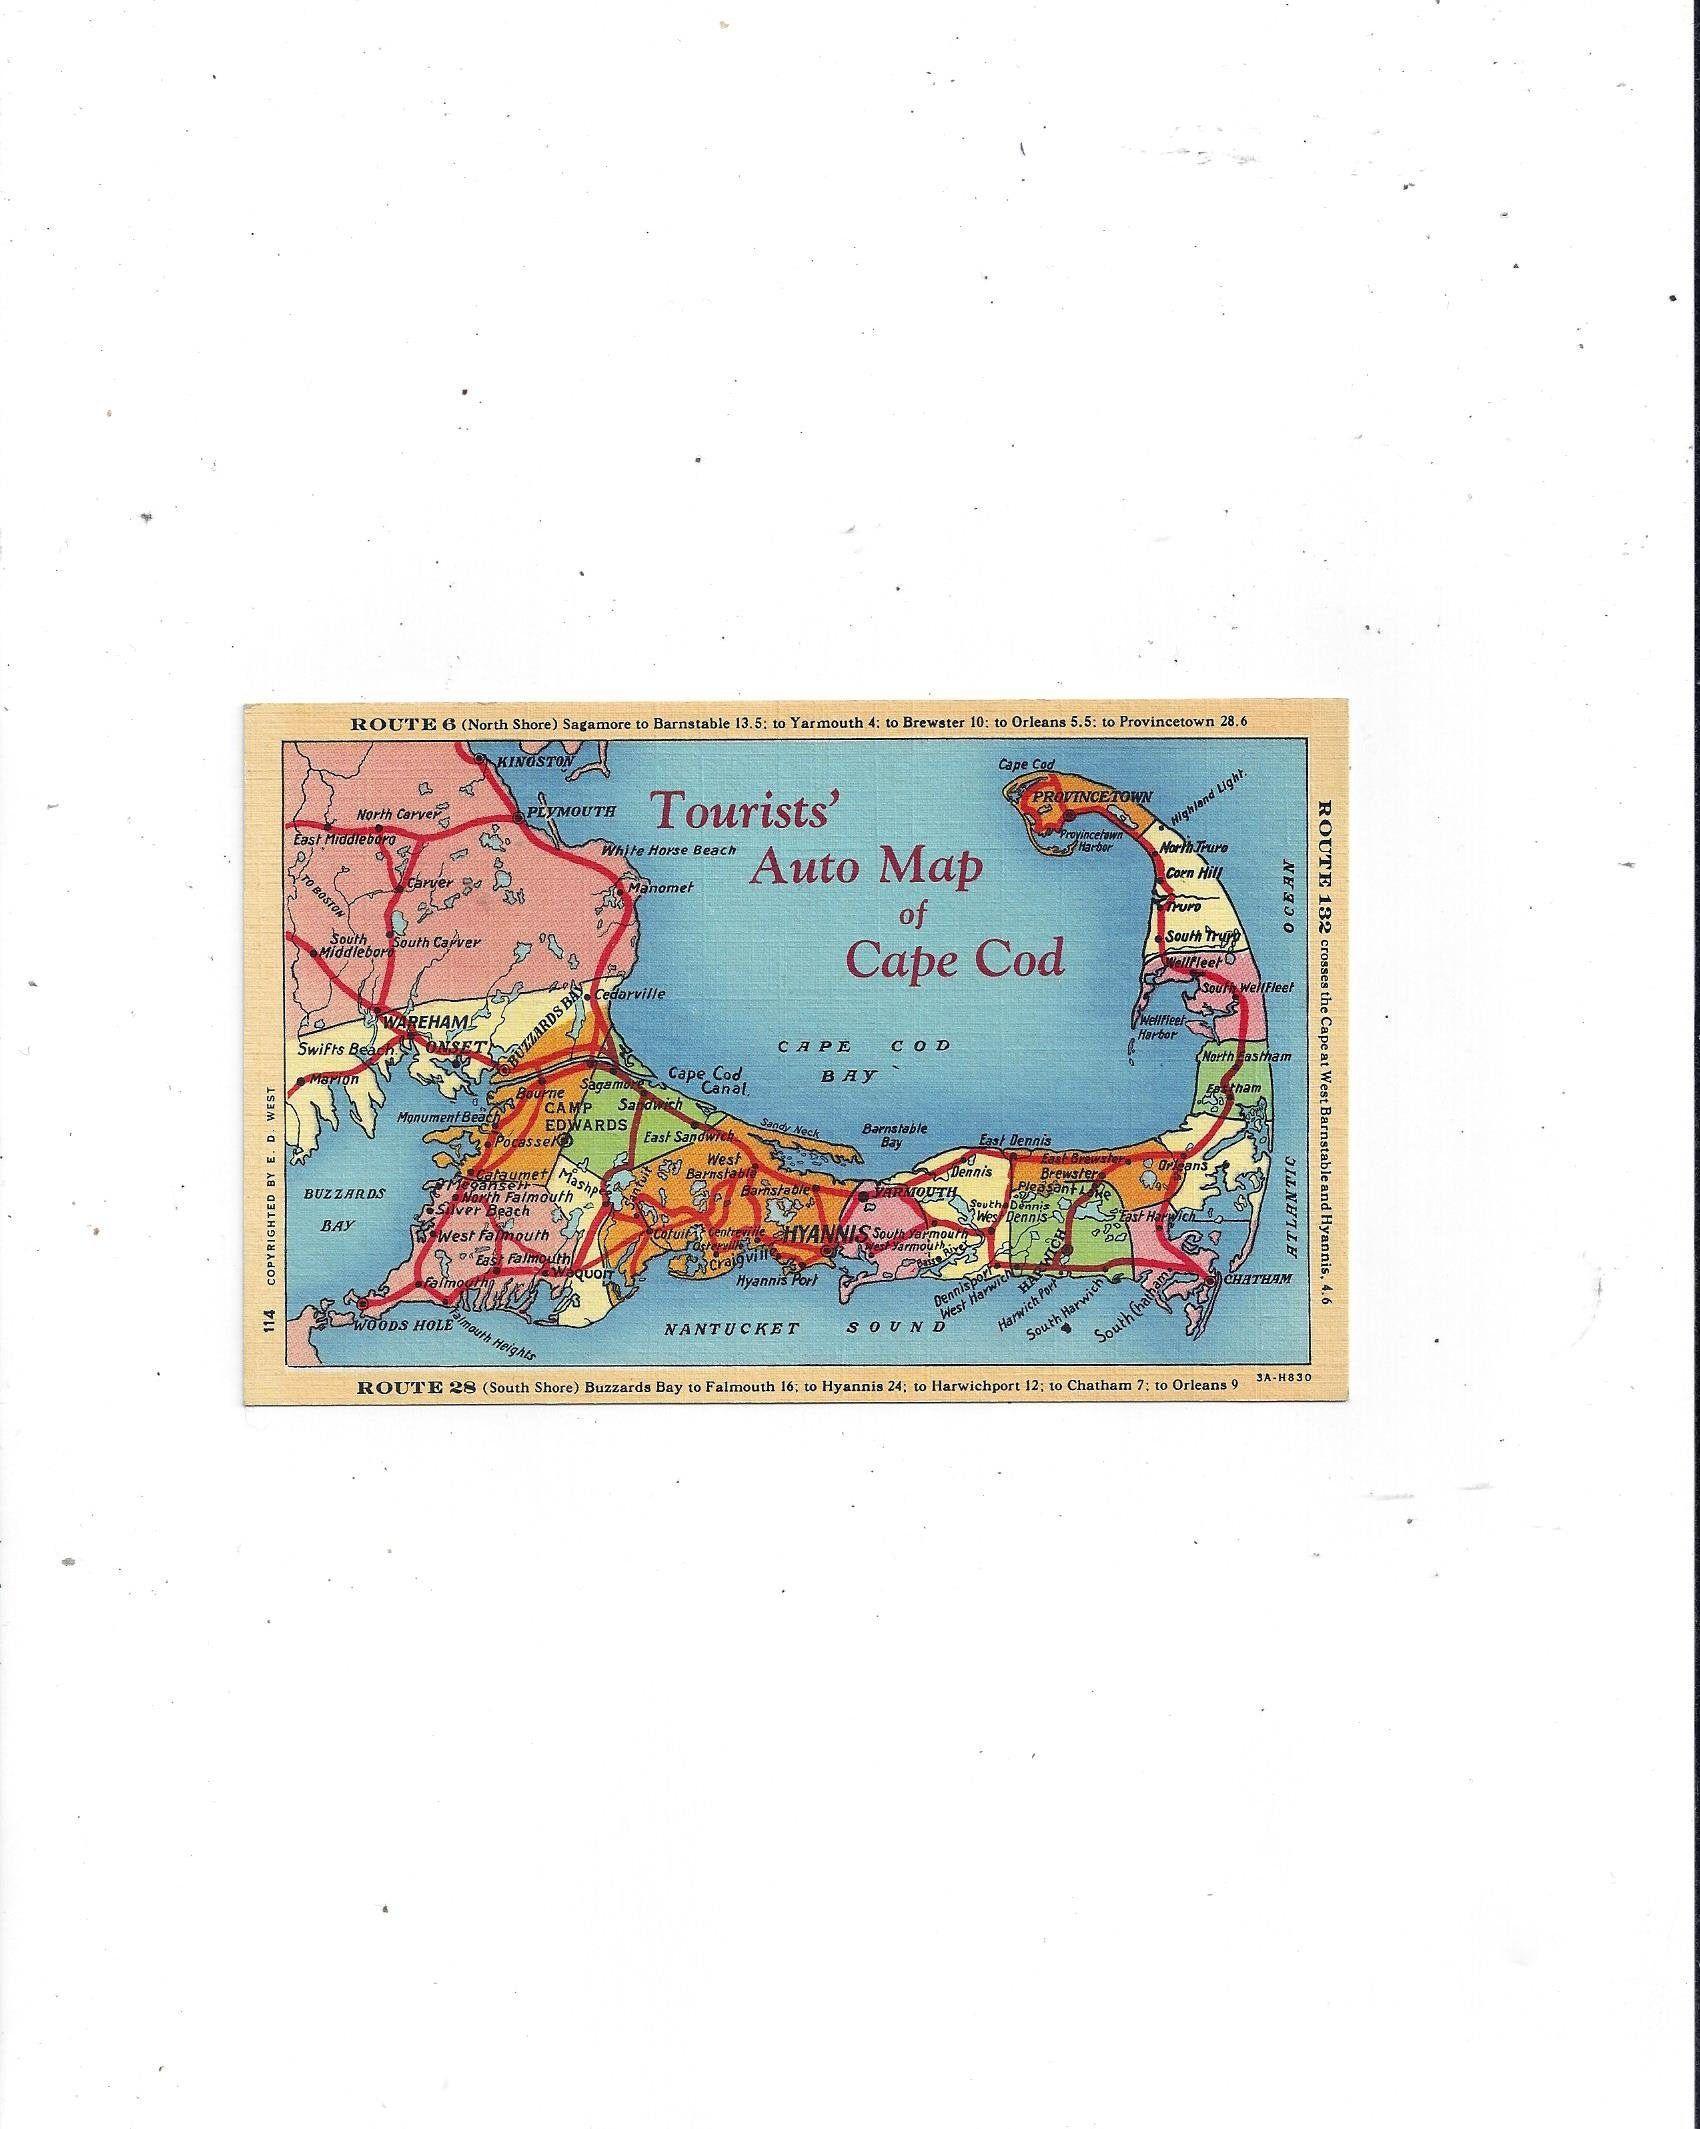 1940s Linen Postcard of Tourists/' Auto Map of Cape Cod Massachusetts Routes 6 Unposted 132 FREE USA Ship 28 Travel Souvenir